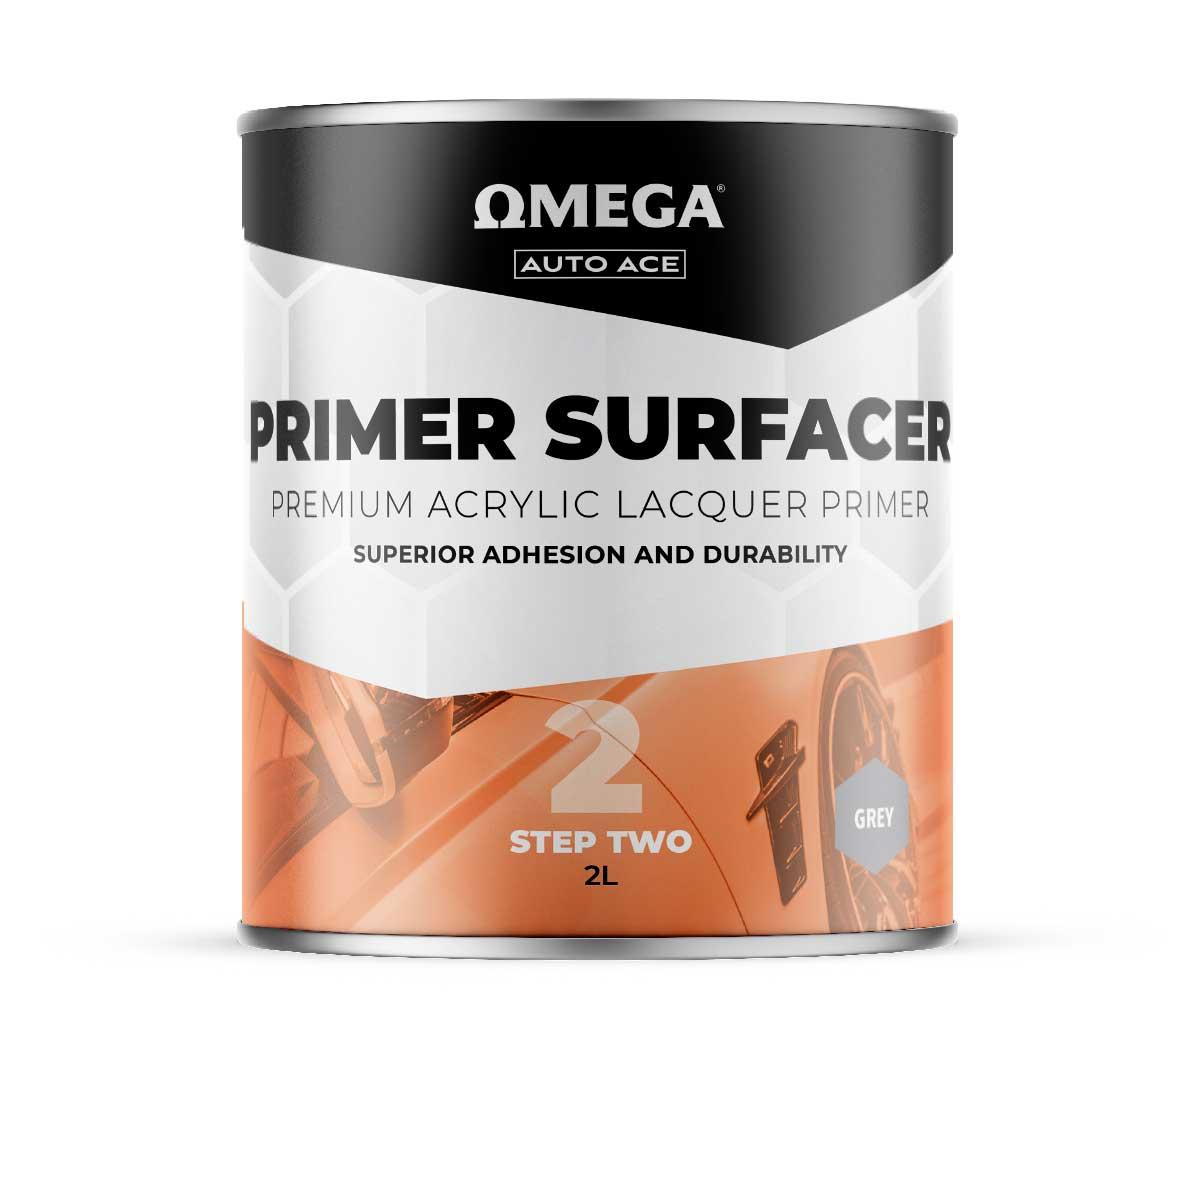 Omega Auto Ace Acrylic Primer Surfacer Grey 2lt